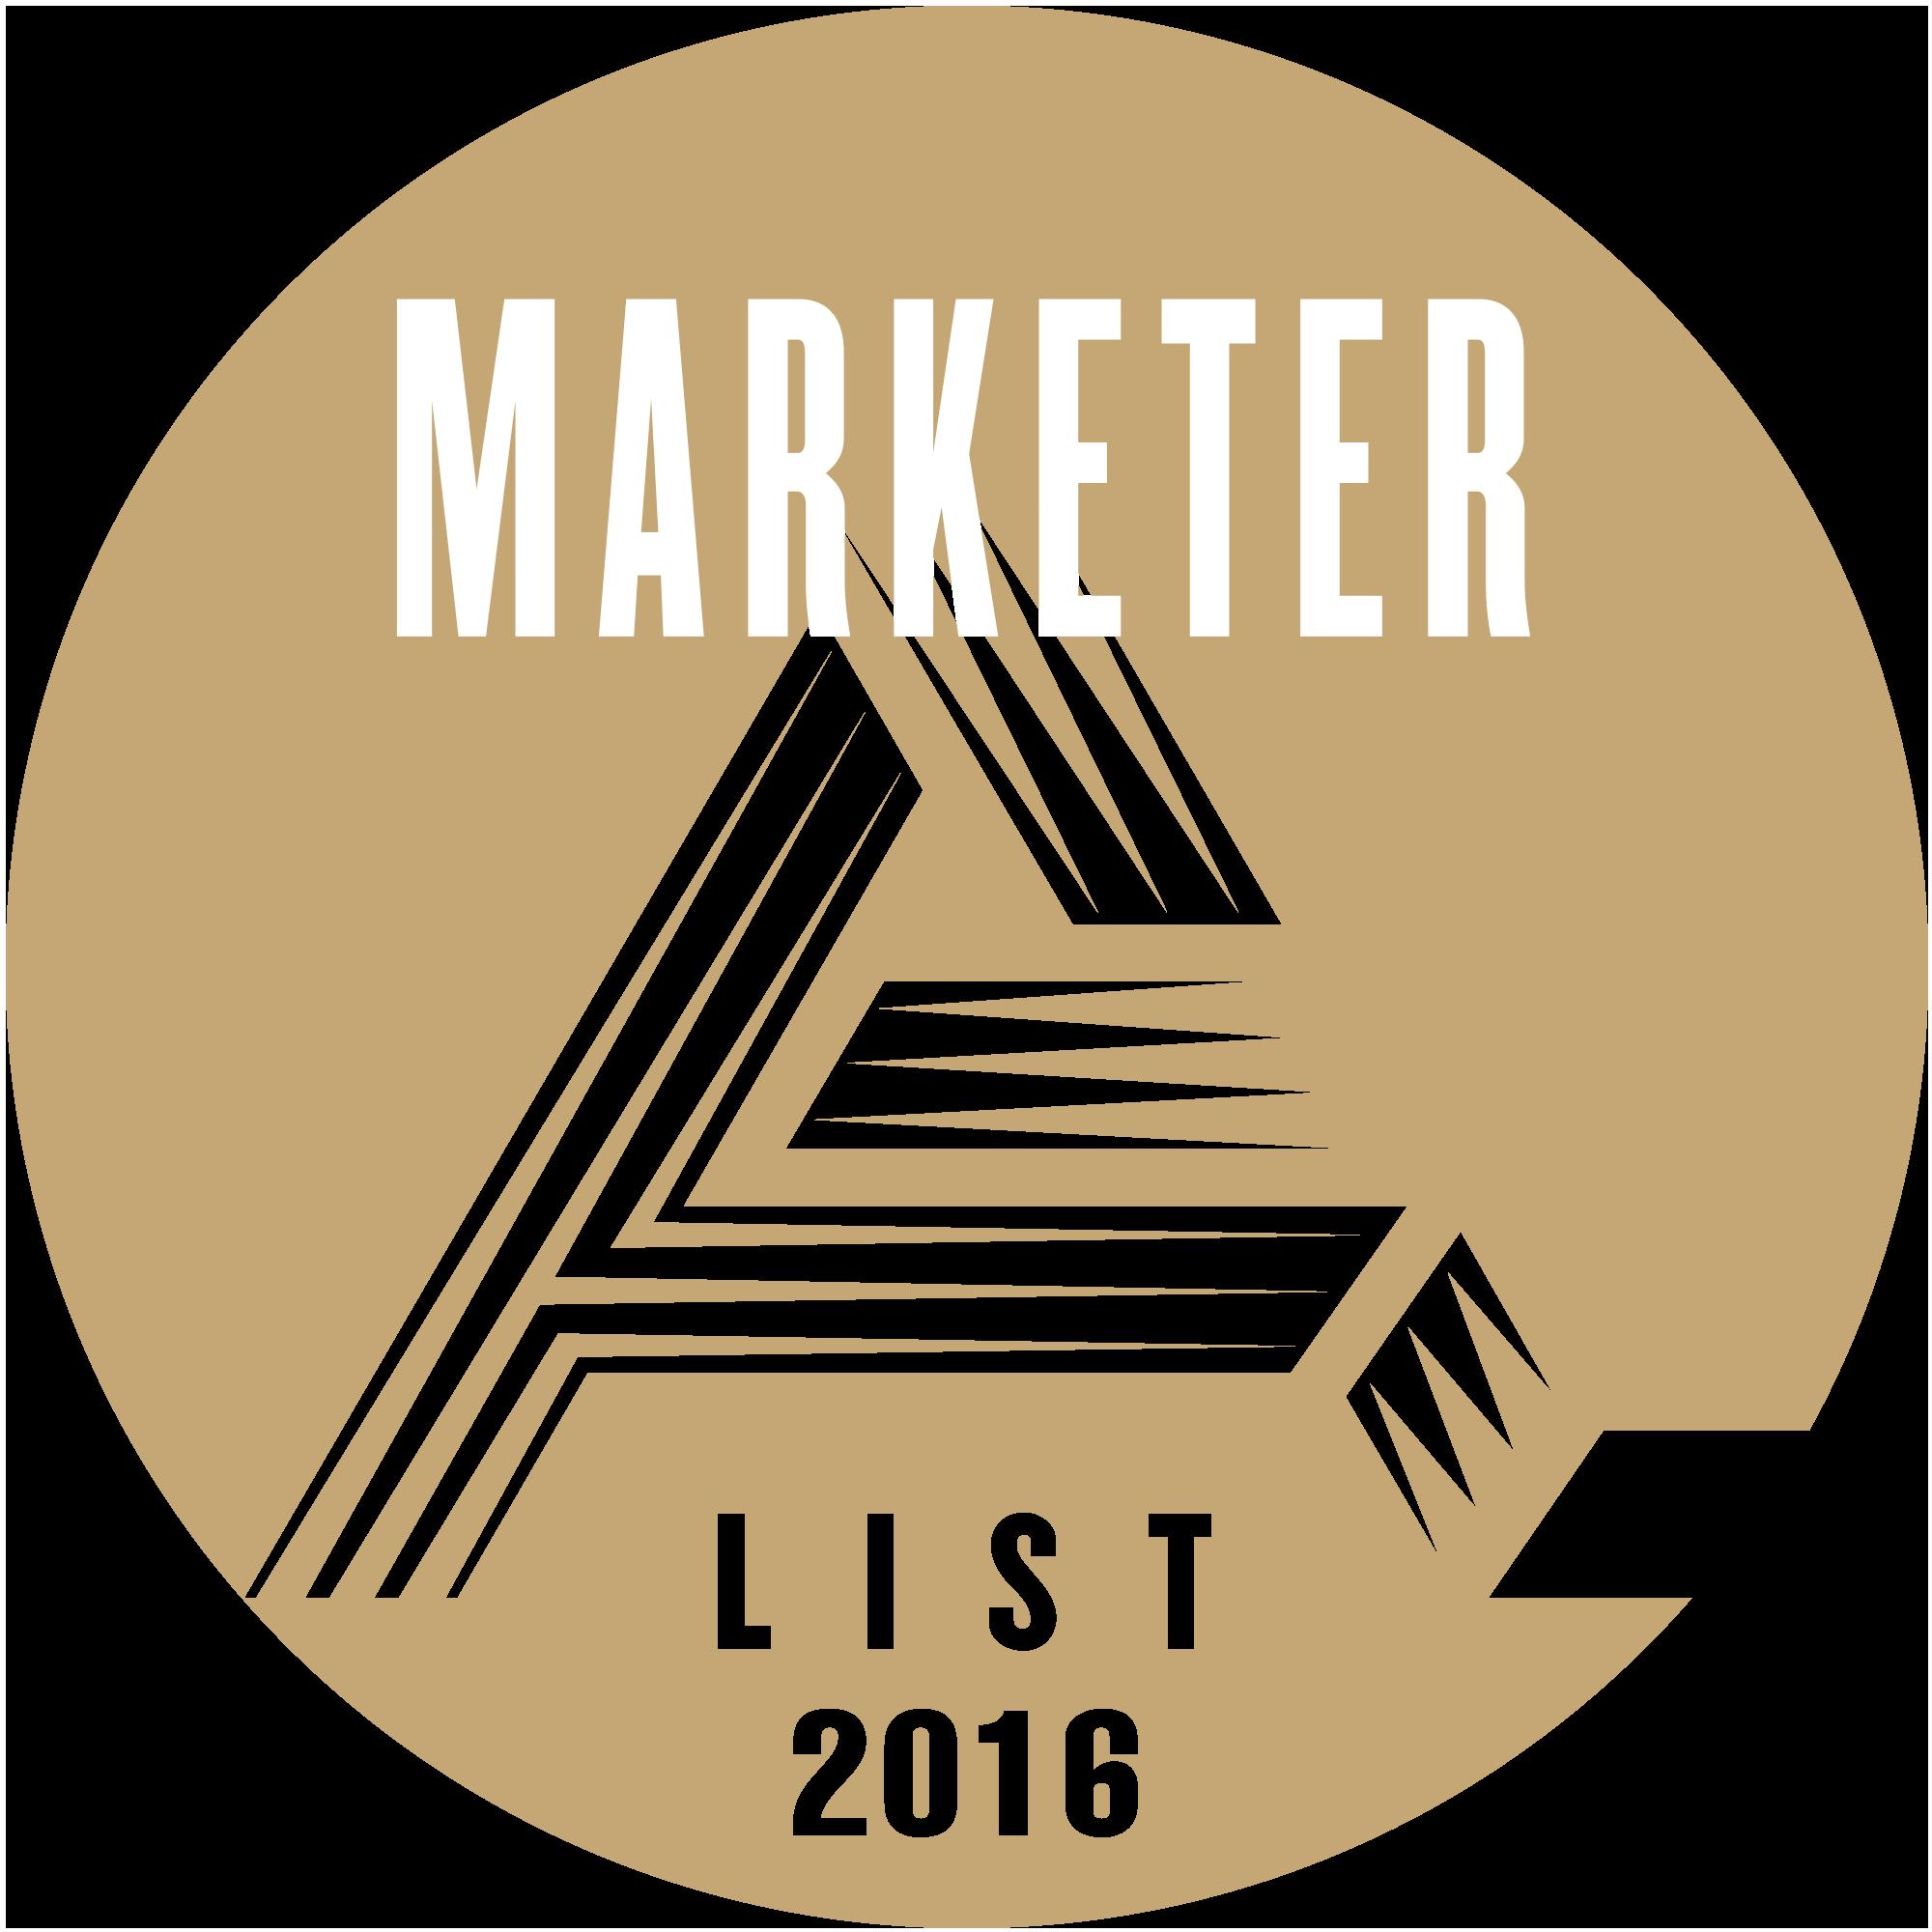 Netflix Tops Ad Age's 2016 Marketer AList Marketing